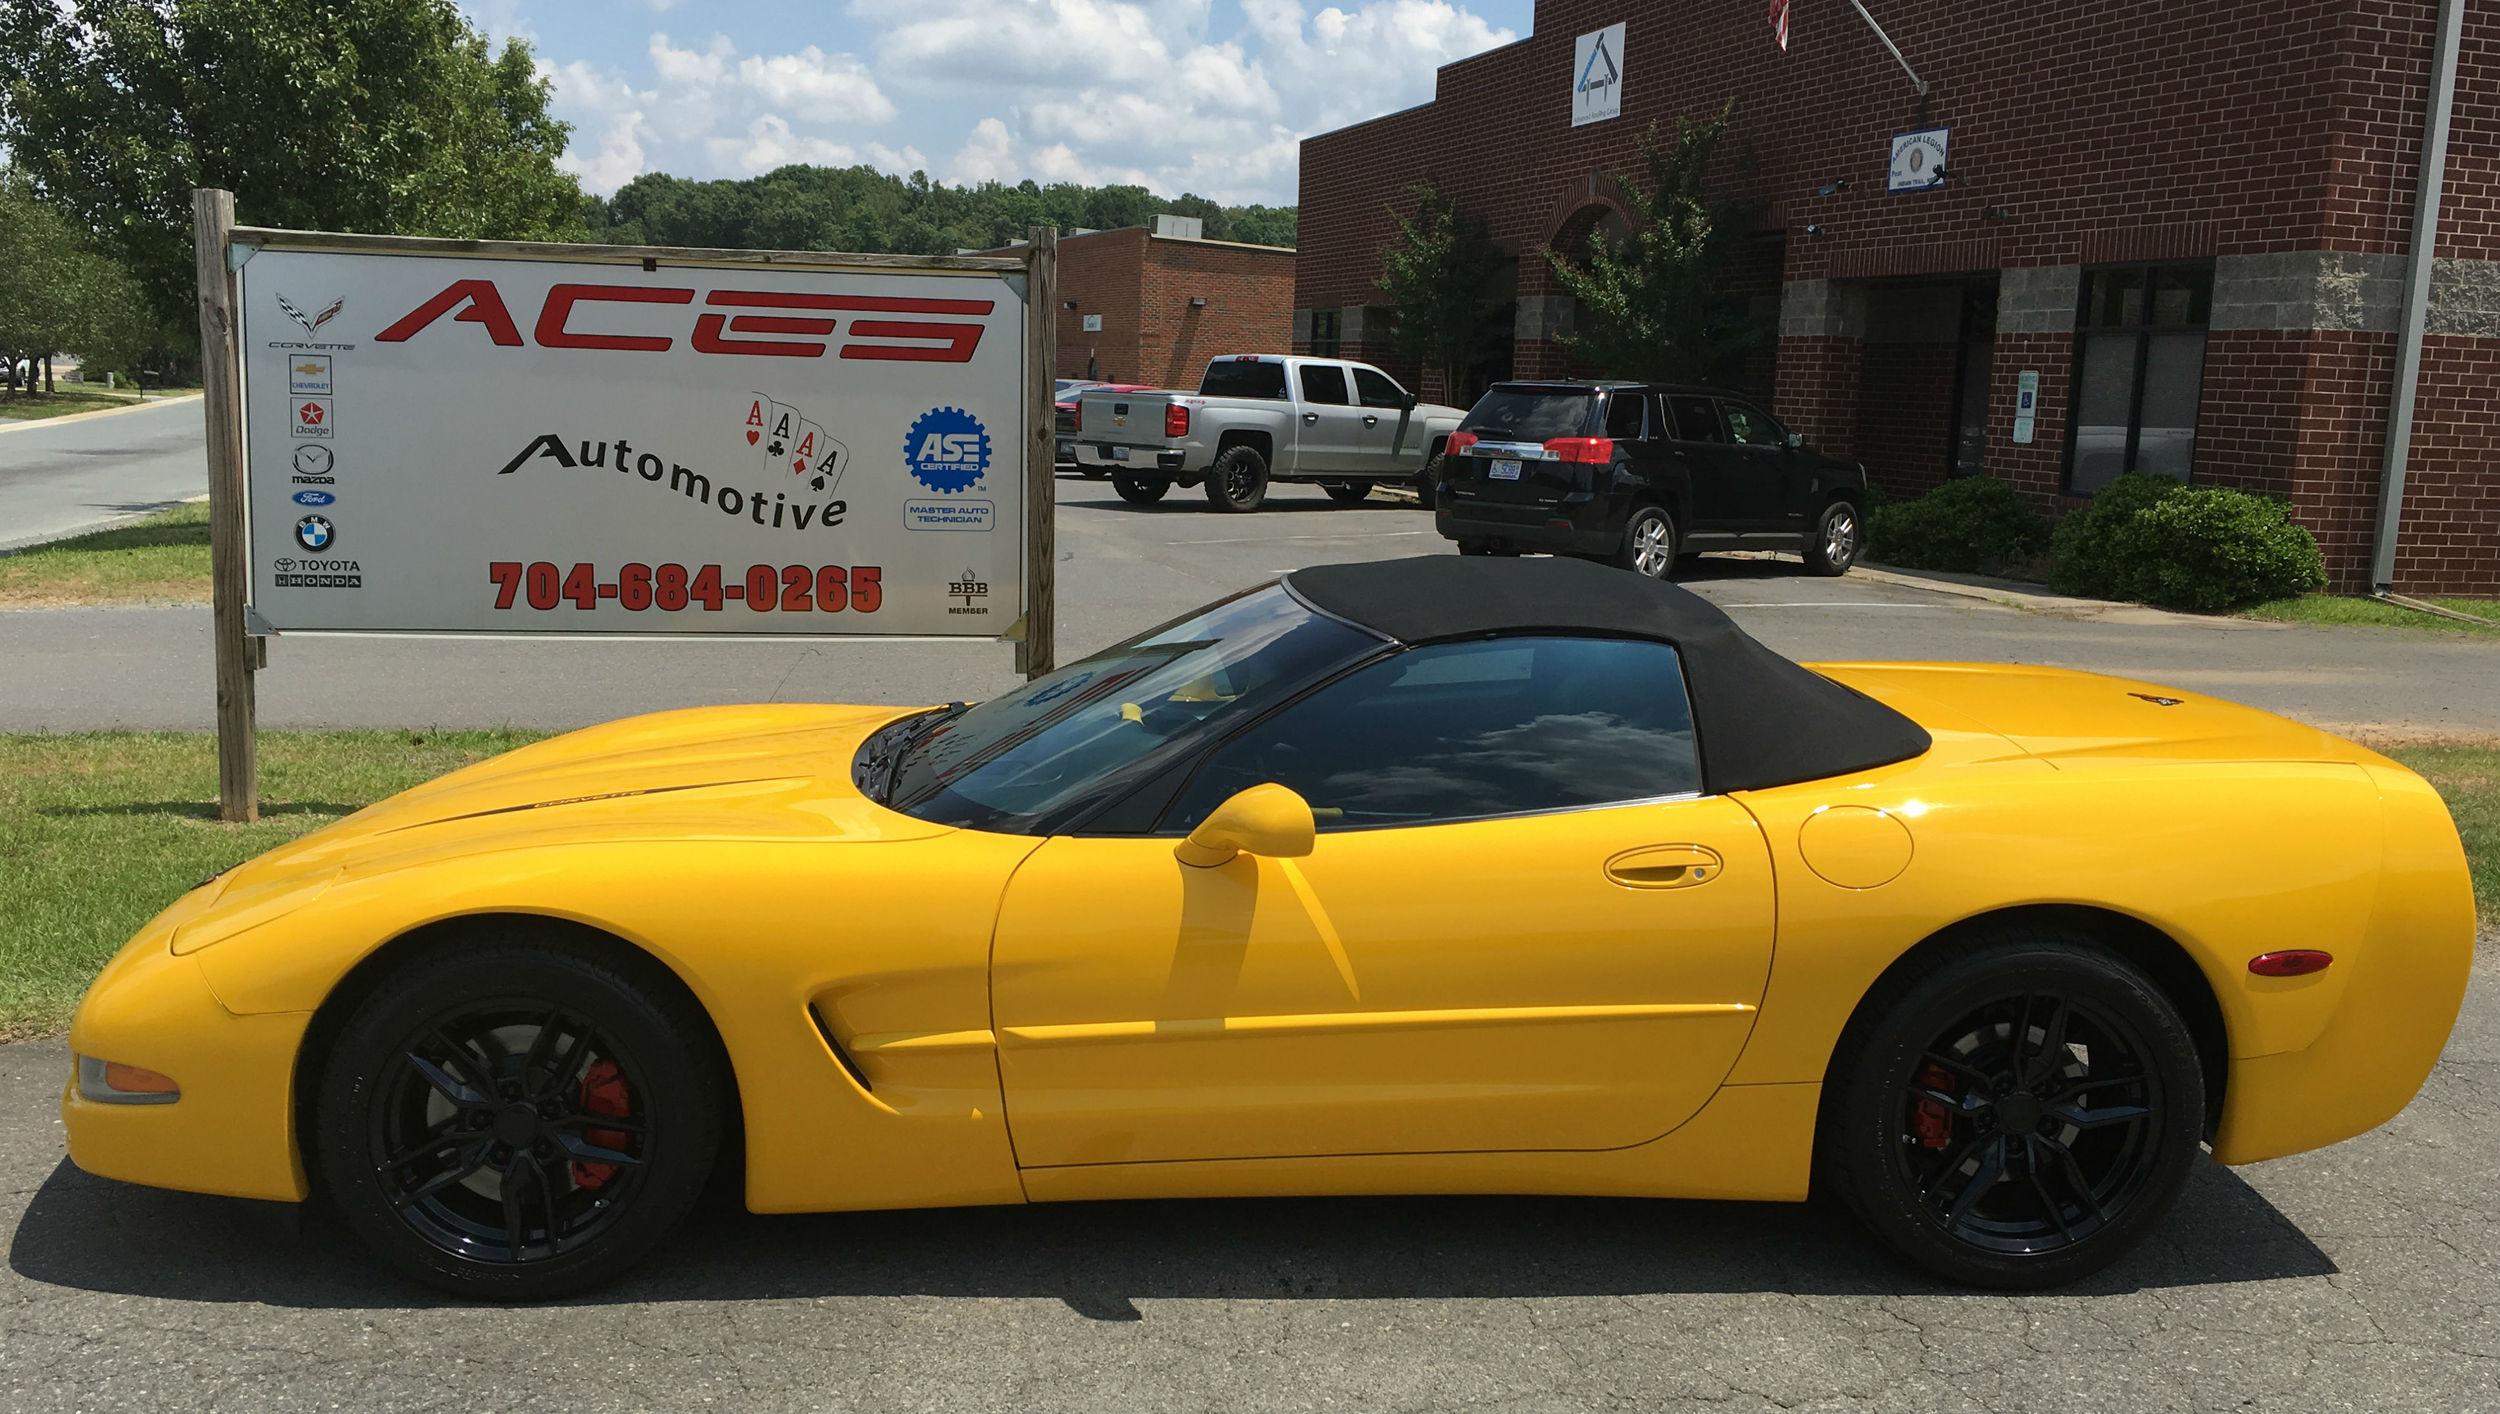 Indian Trail Corvette repair services